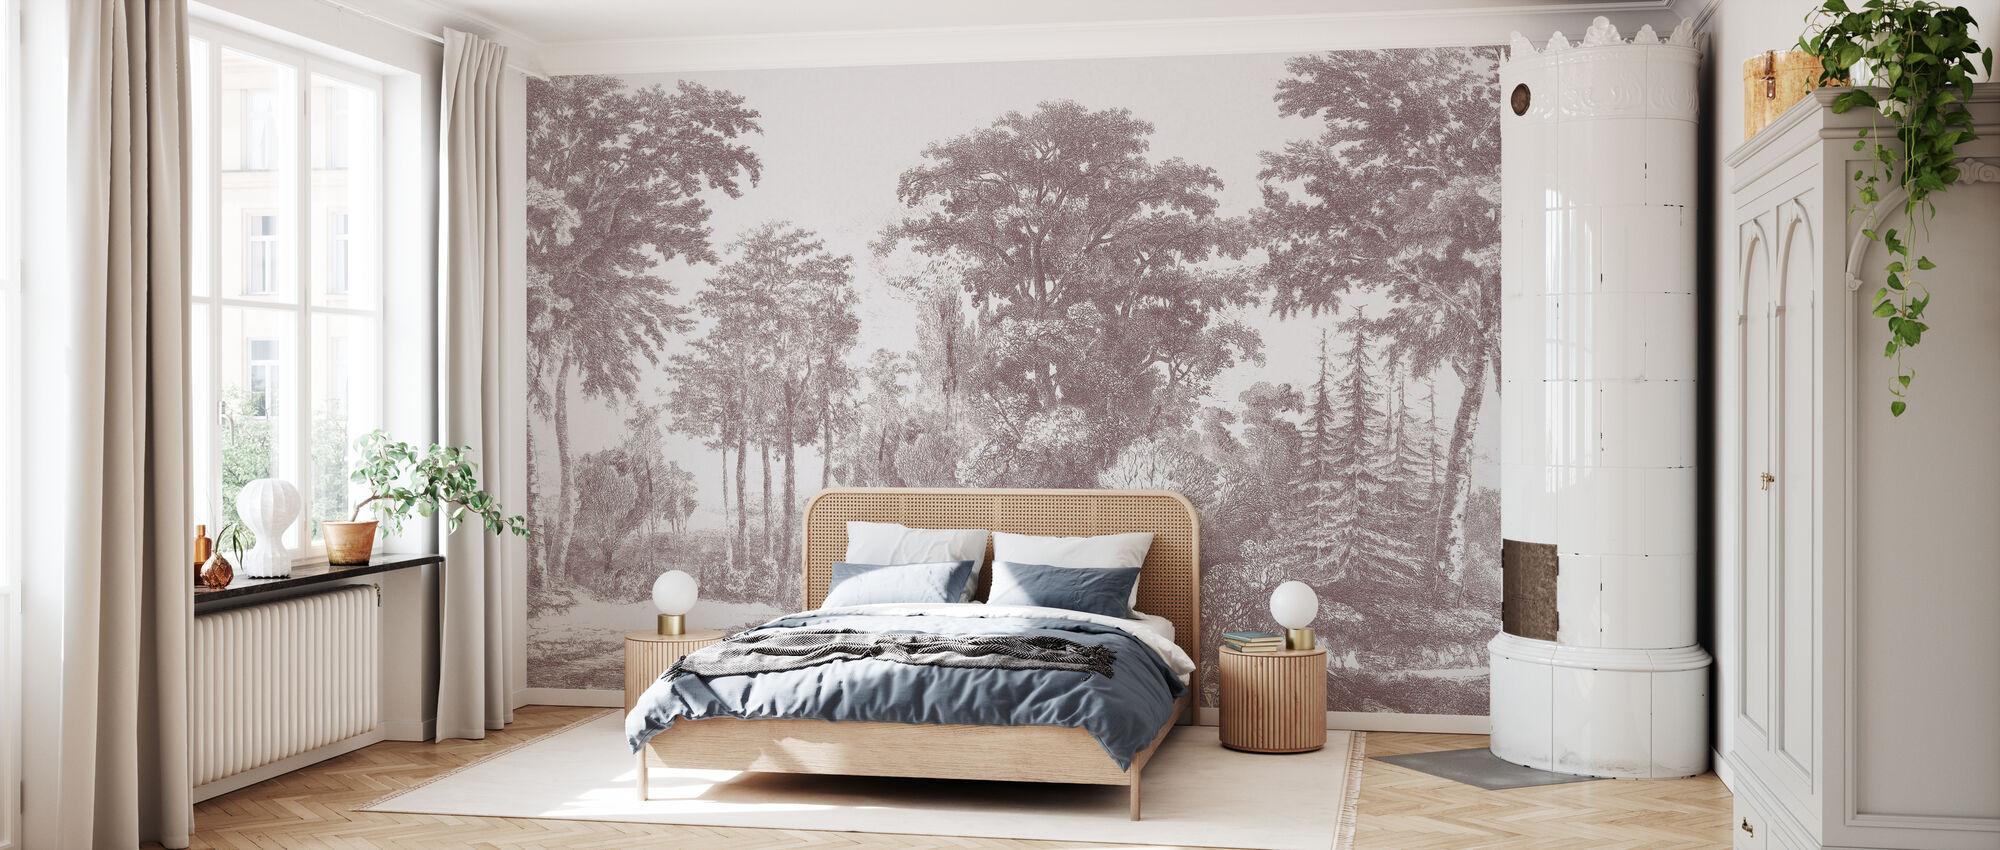 Slow Meander - Bordeaux - Wallpaper - Bedroom